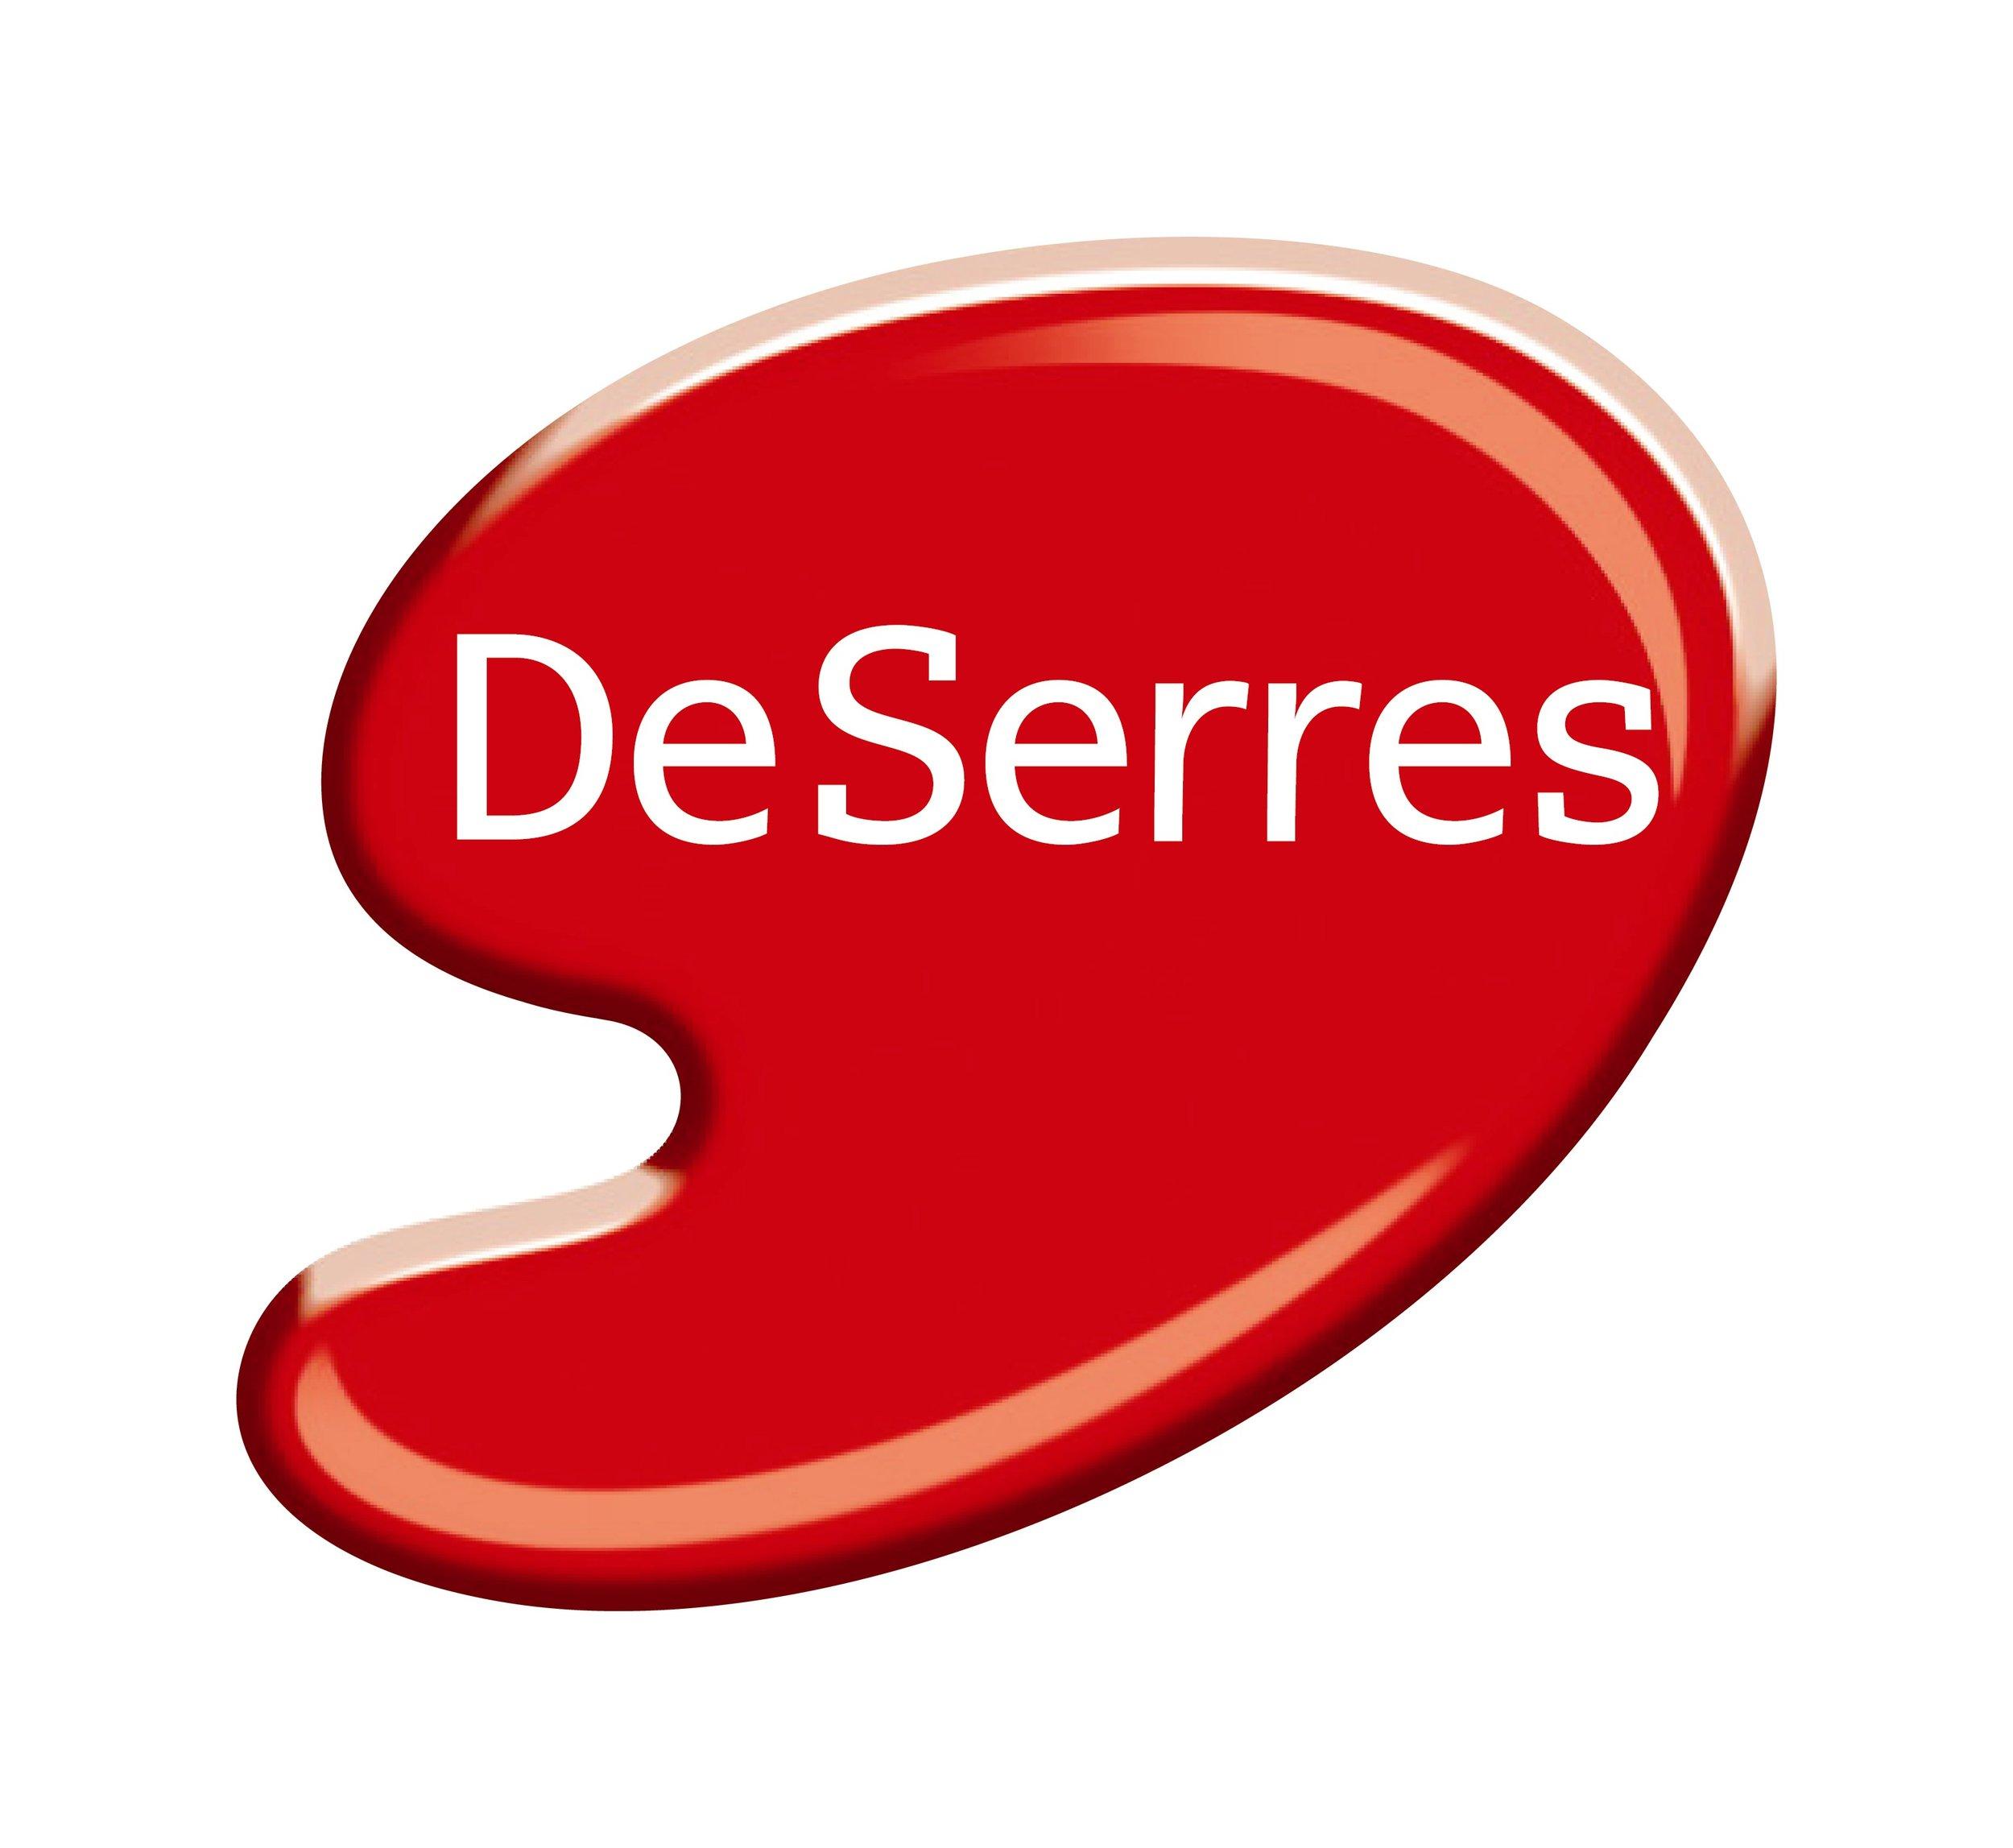 DeSerres_3D_signalisation_4clr [Converted].jpg